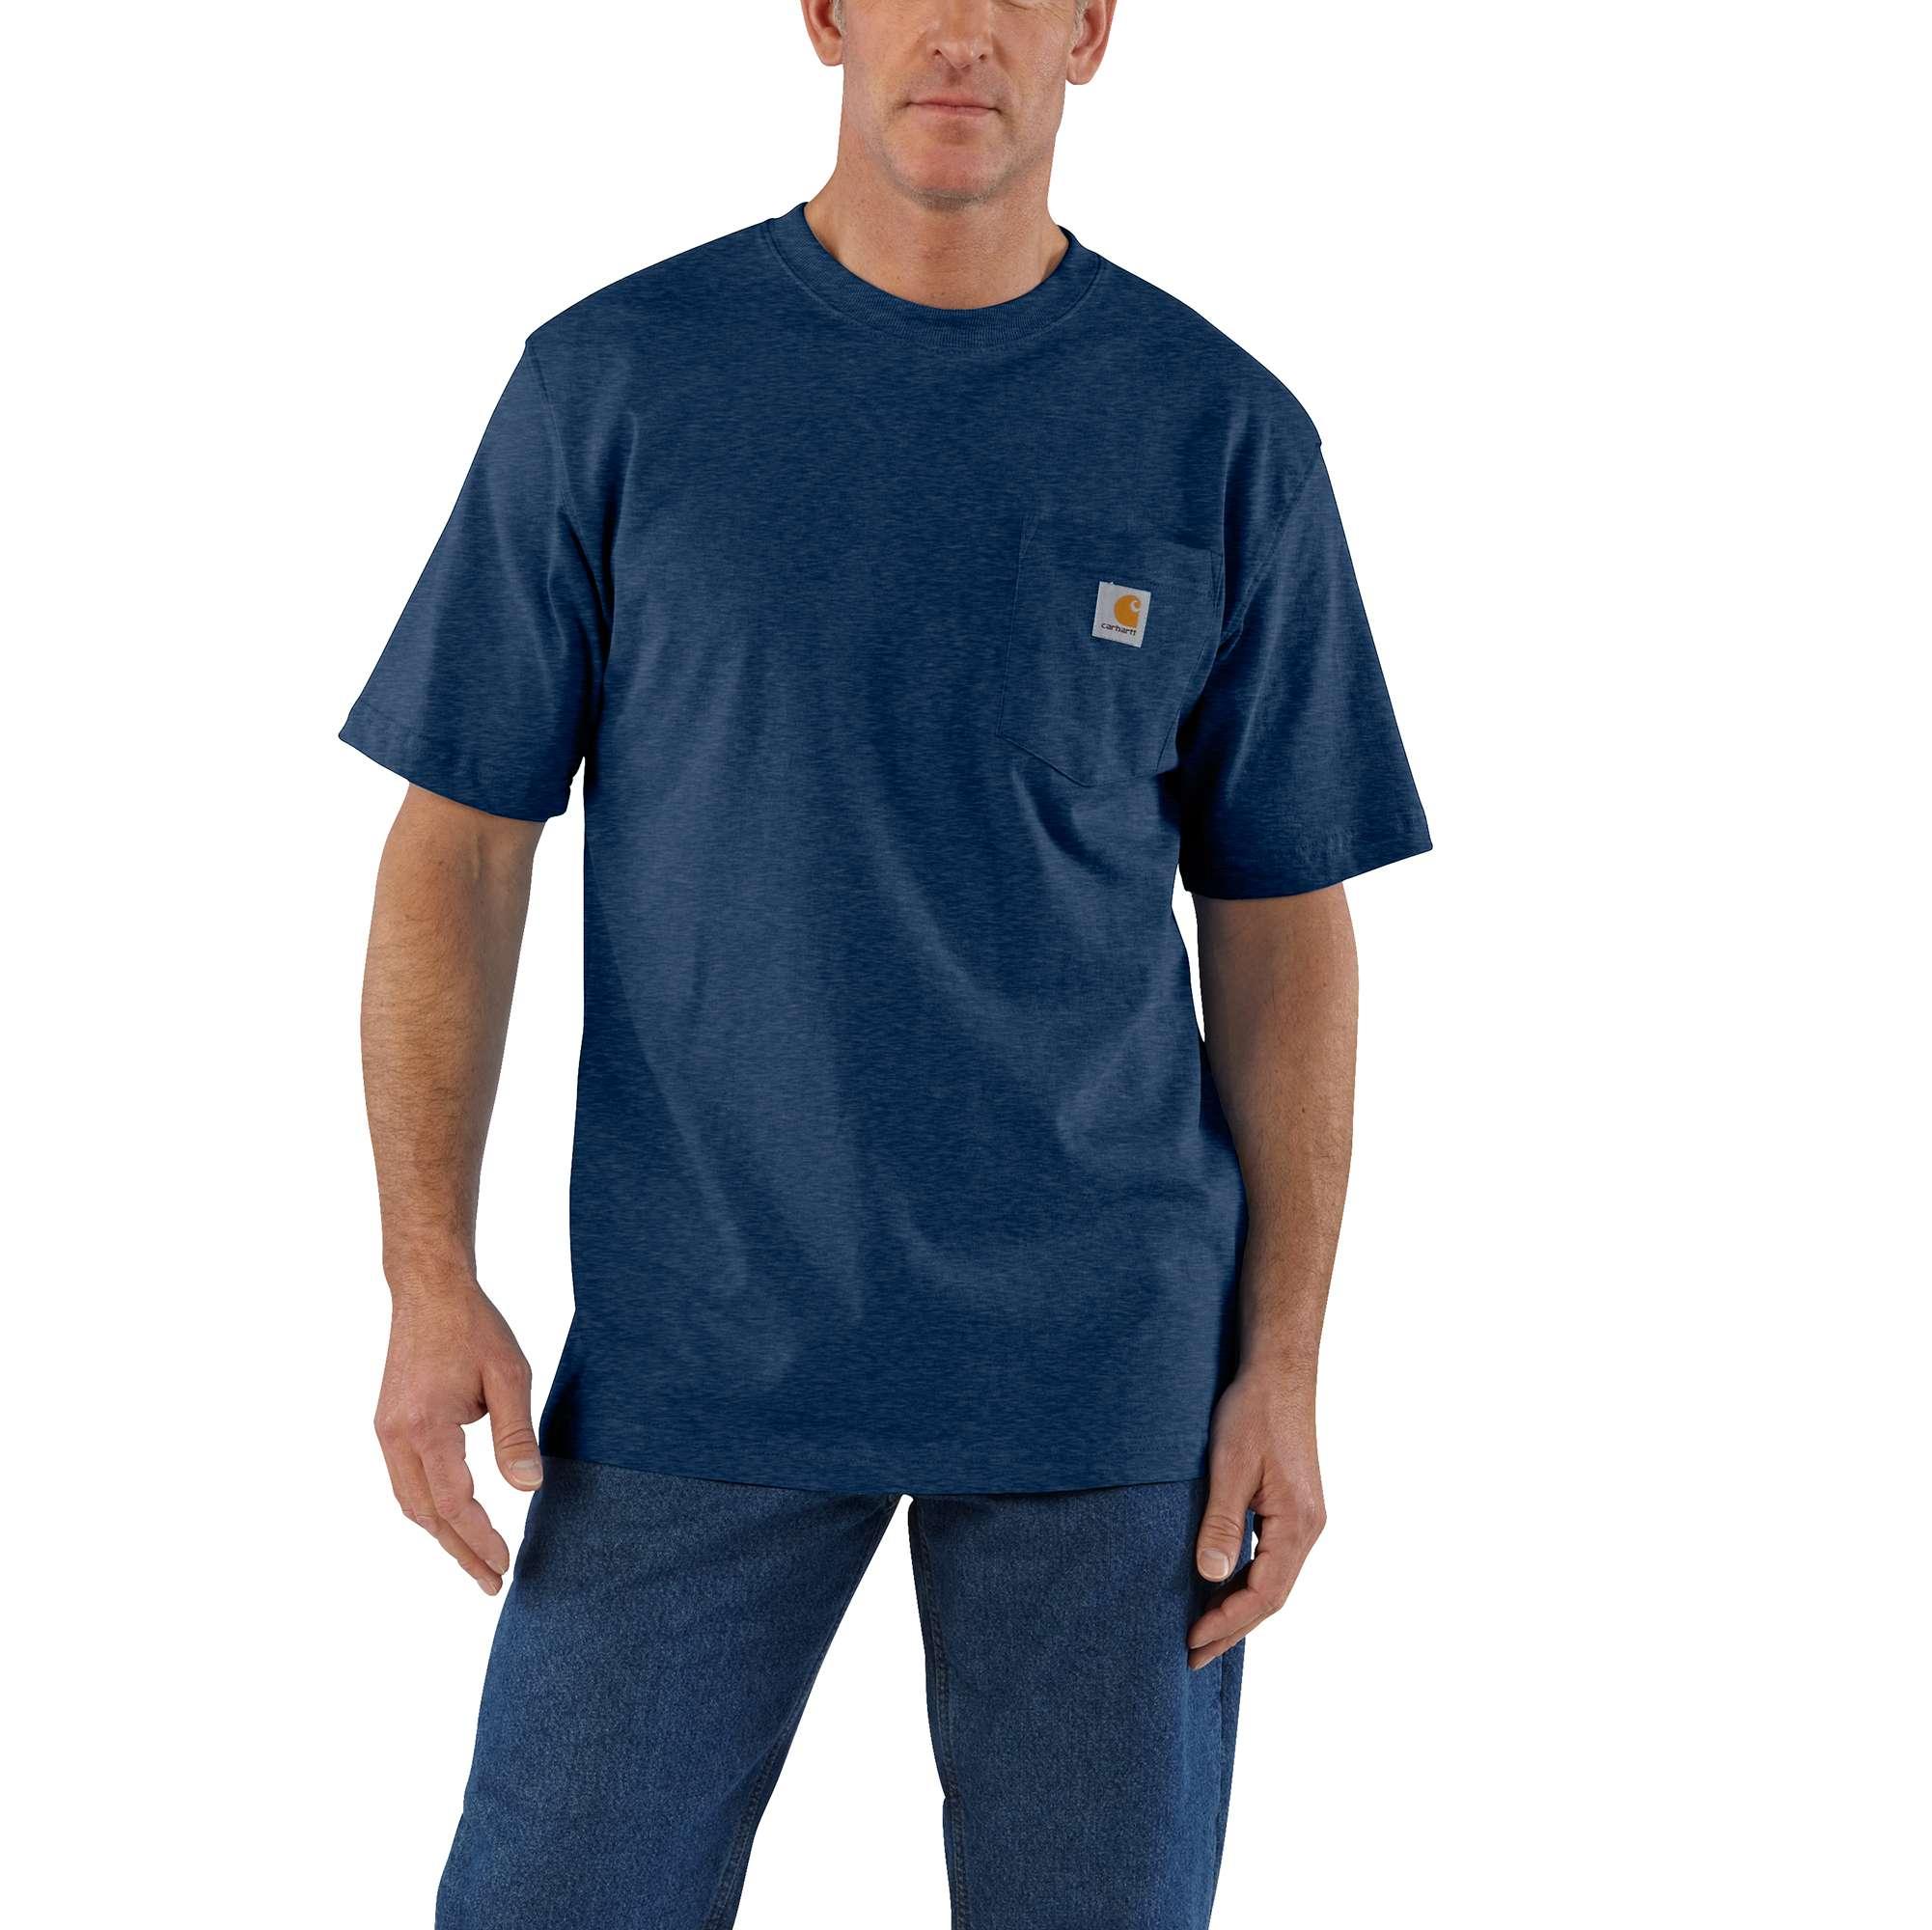 Men's Workwear Pocket Tee, Heather Blue, swatch